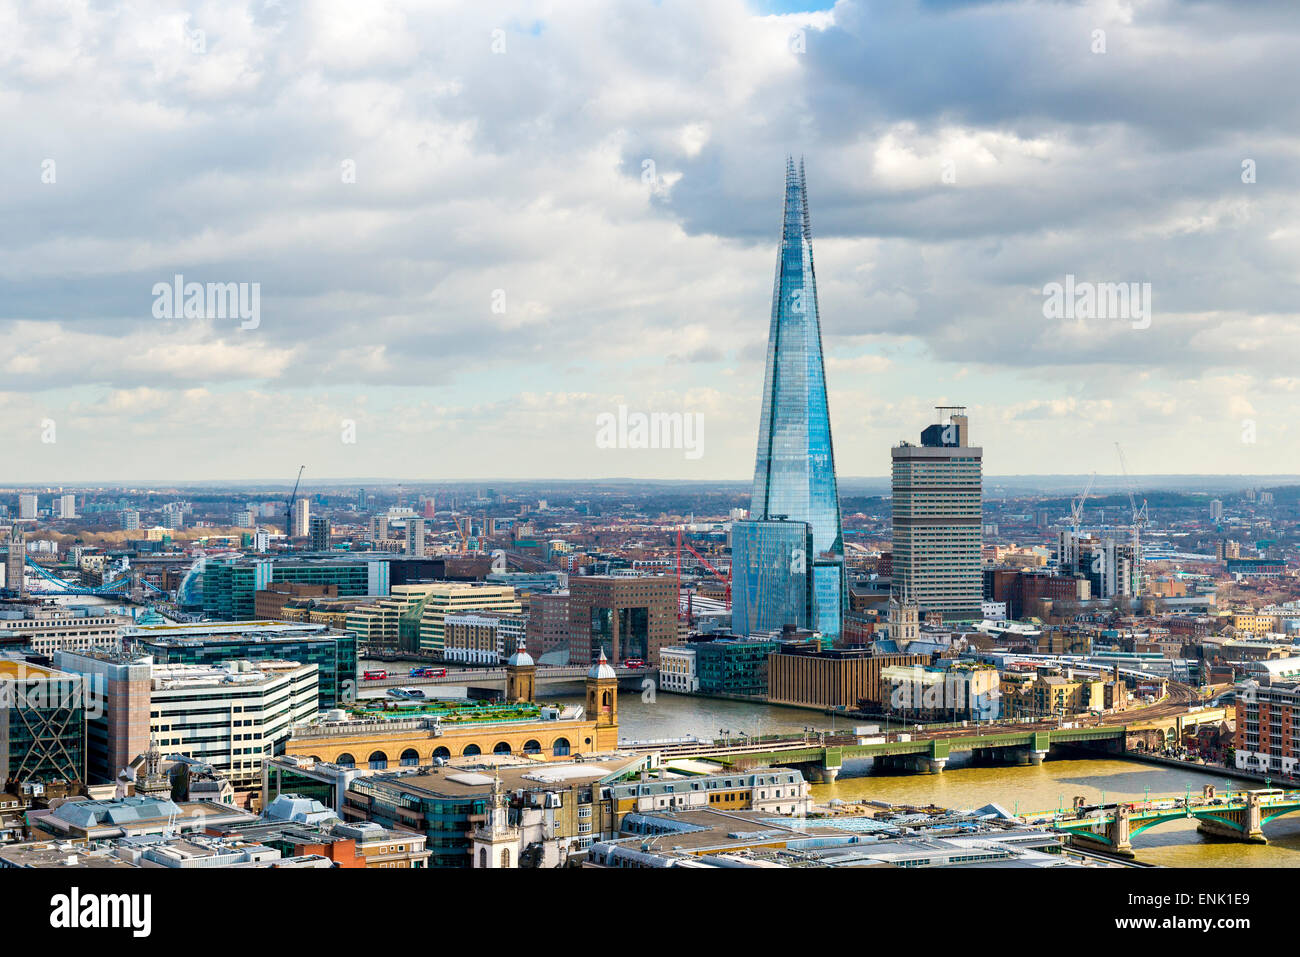 Der Shard, London, England, Vereinigtes Königreich, Europa Stockbild